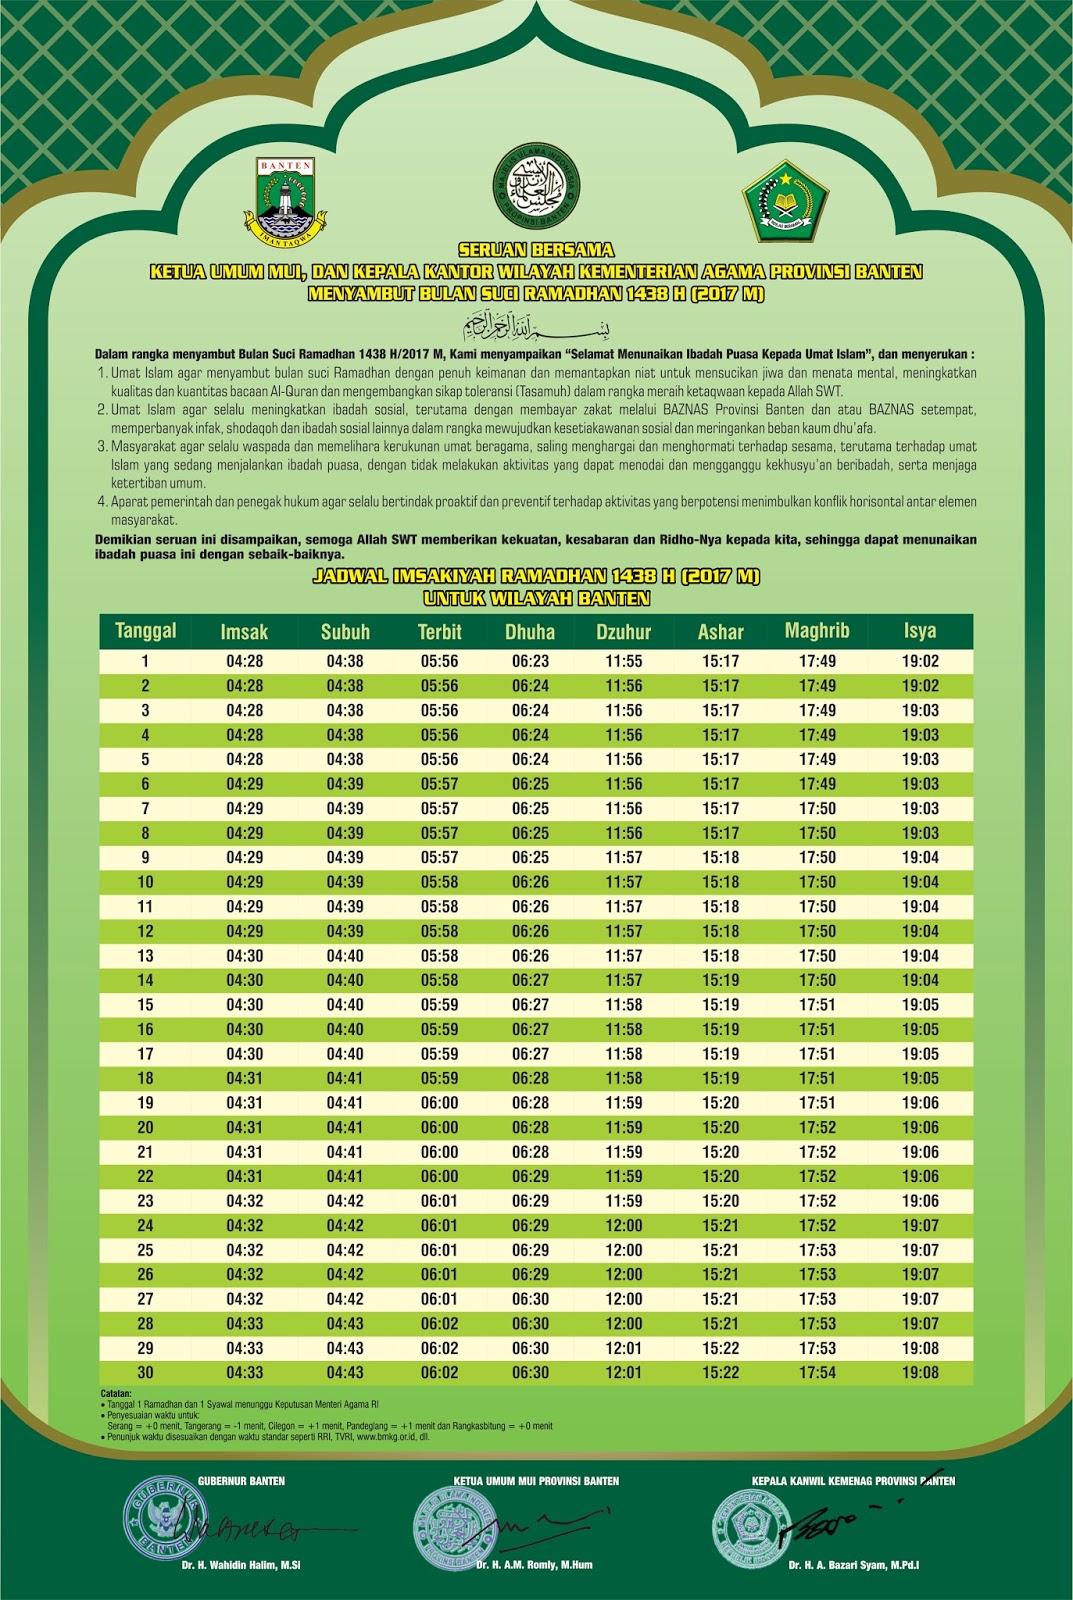 Jadwal Imsakiyah Ramadhan 1438 H Untuk Propinsi Banten ...